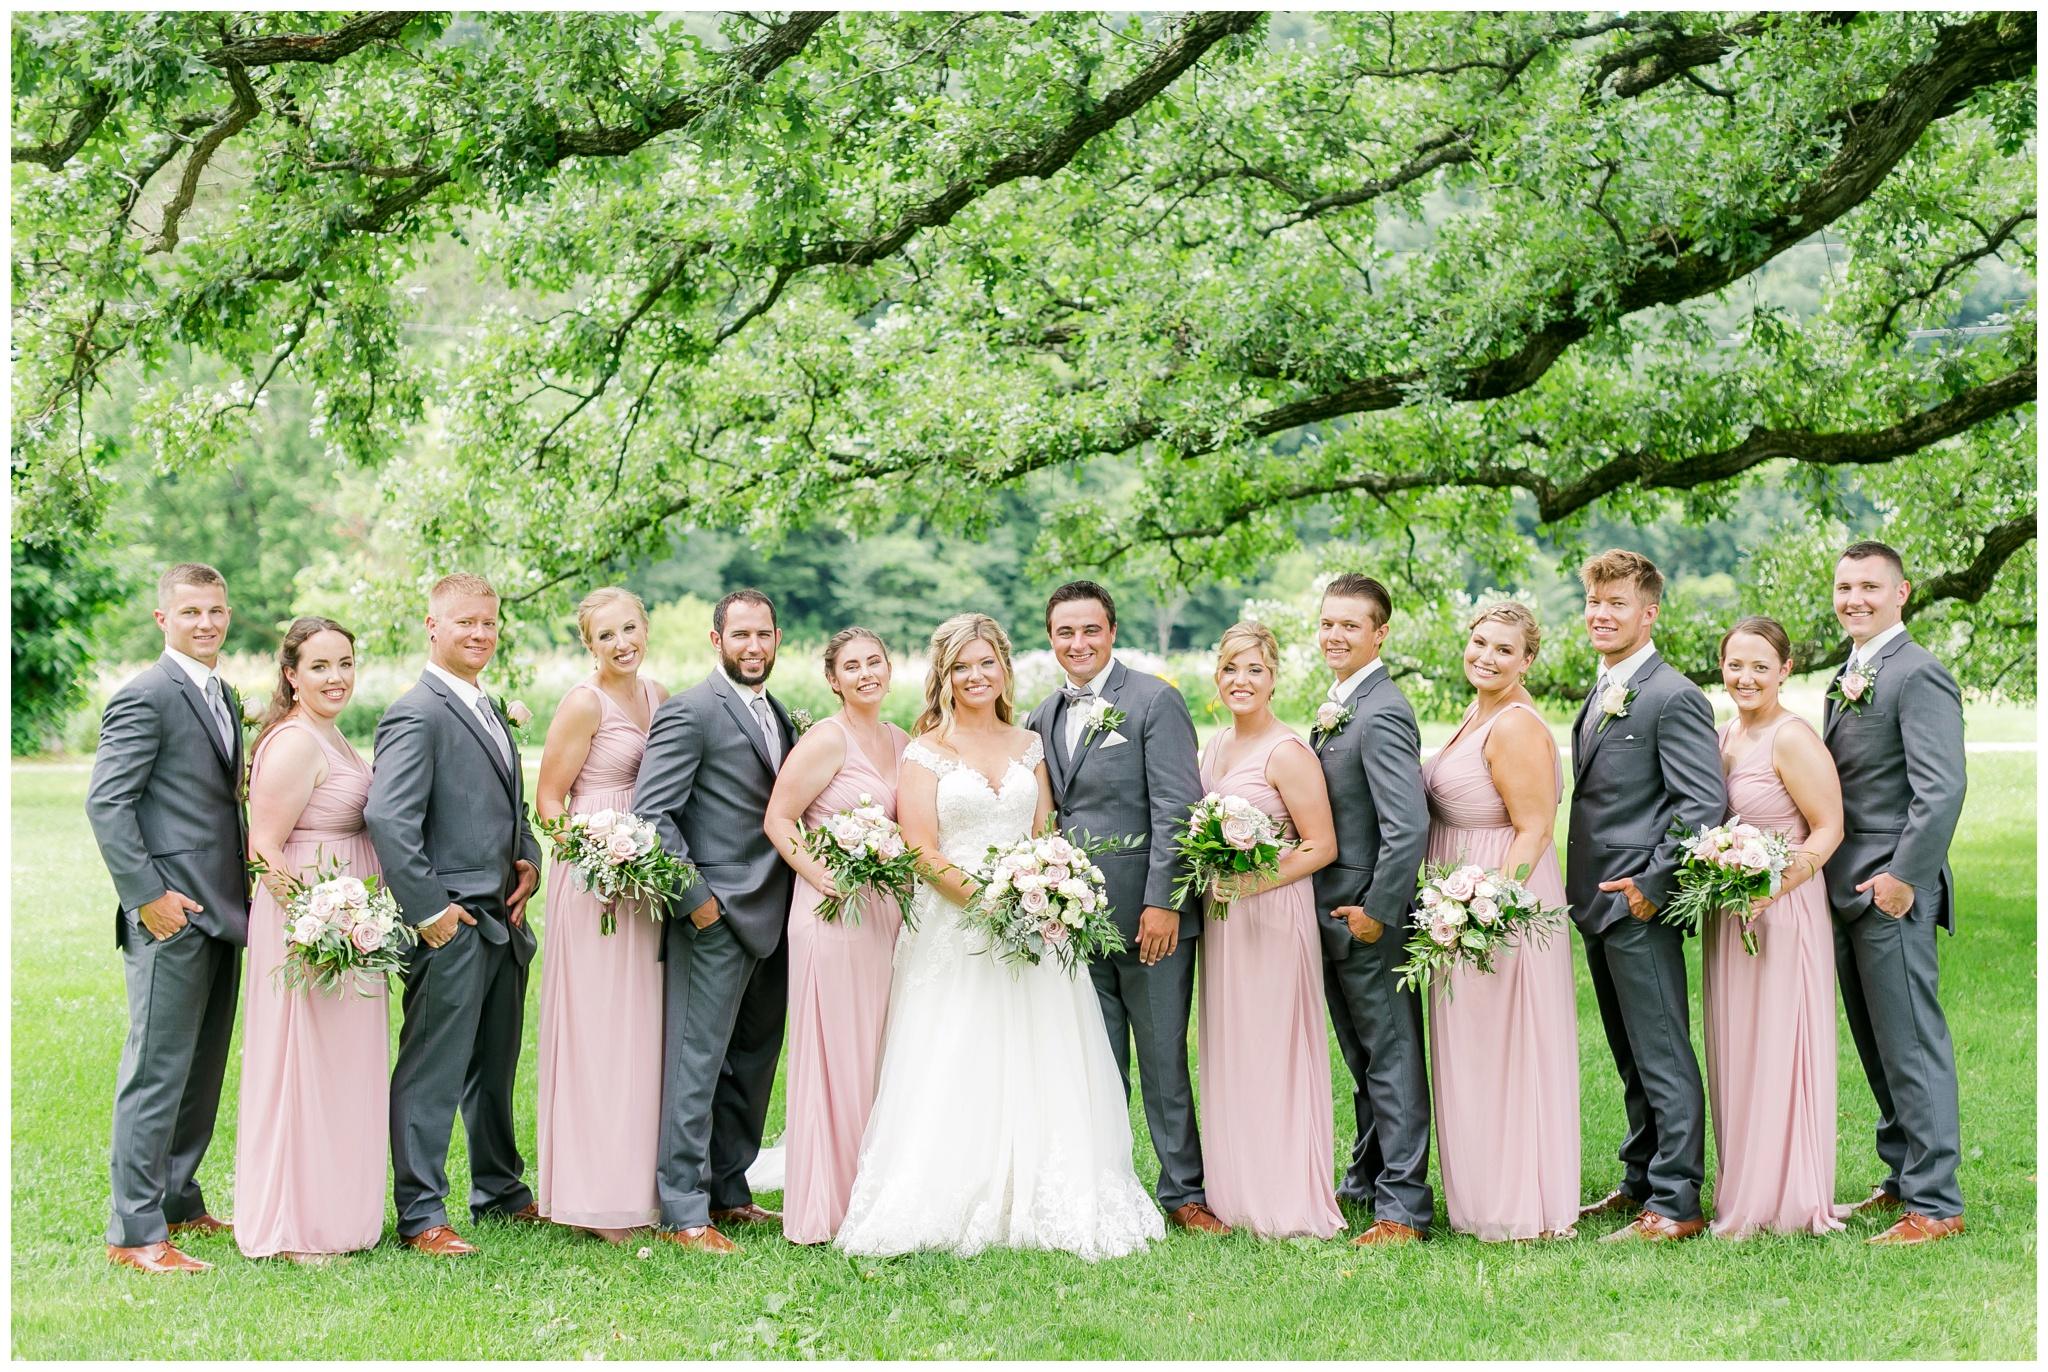 Sugarland_barn_arena_wisconsin_wedding_madison_wisconsin_4272.jpg